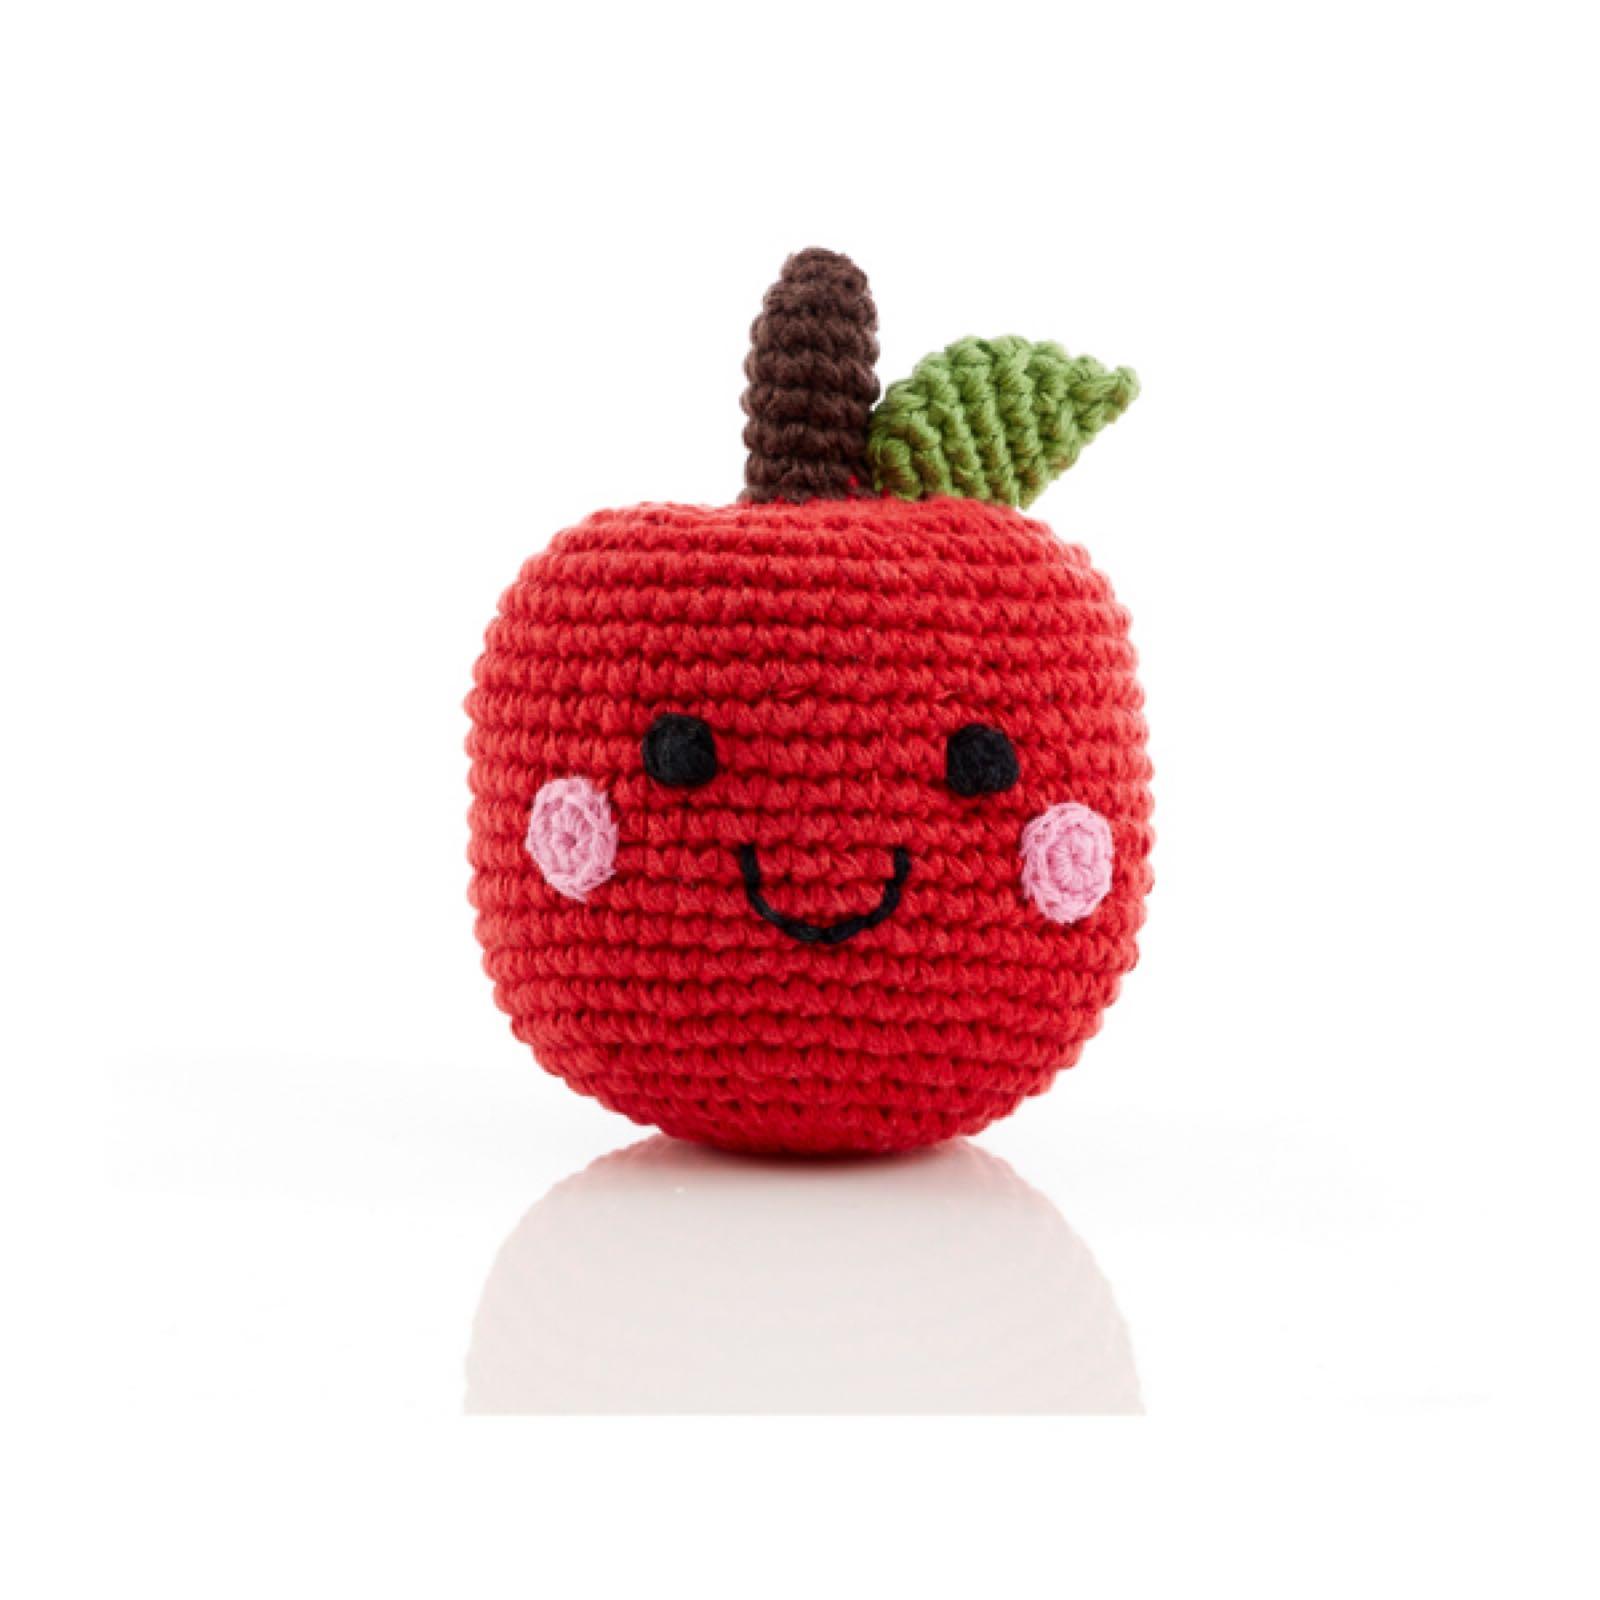 Pebble - Crochet cotton rattle - Apple